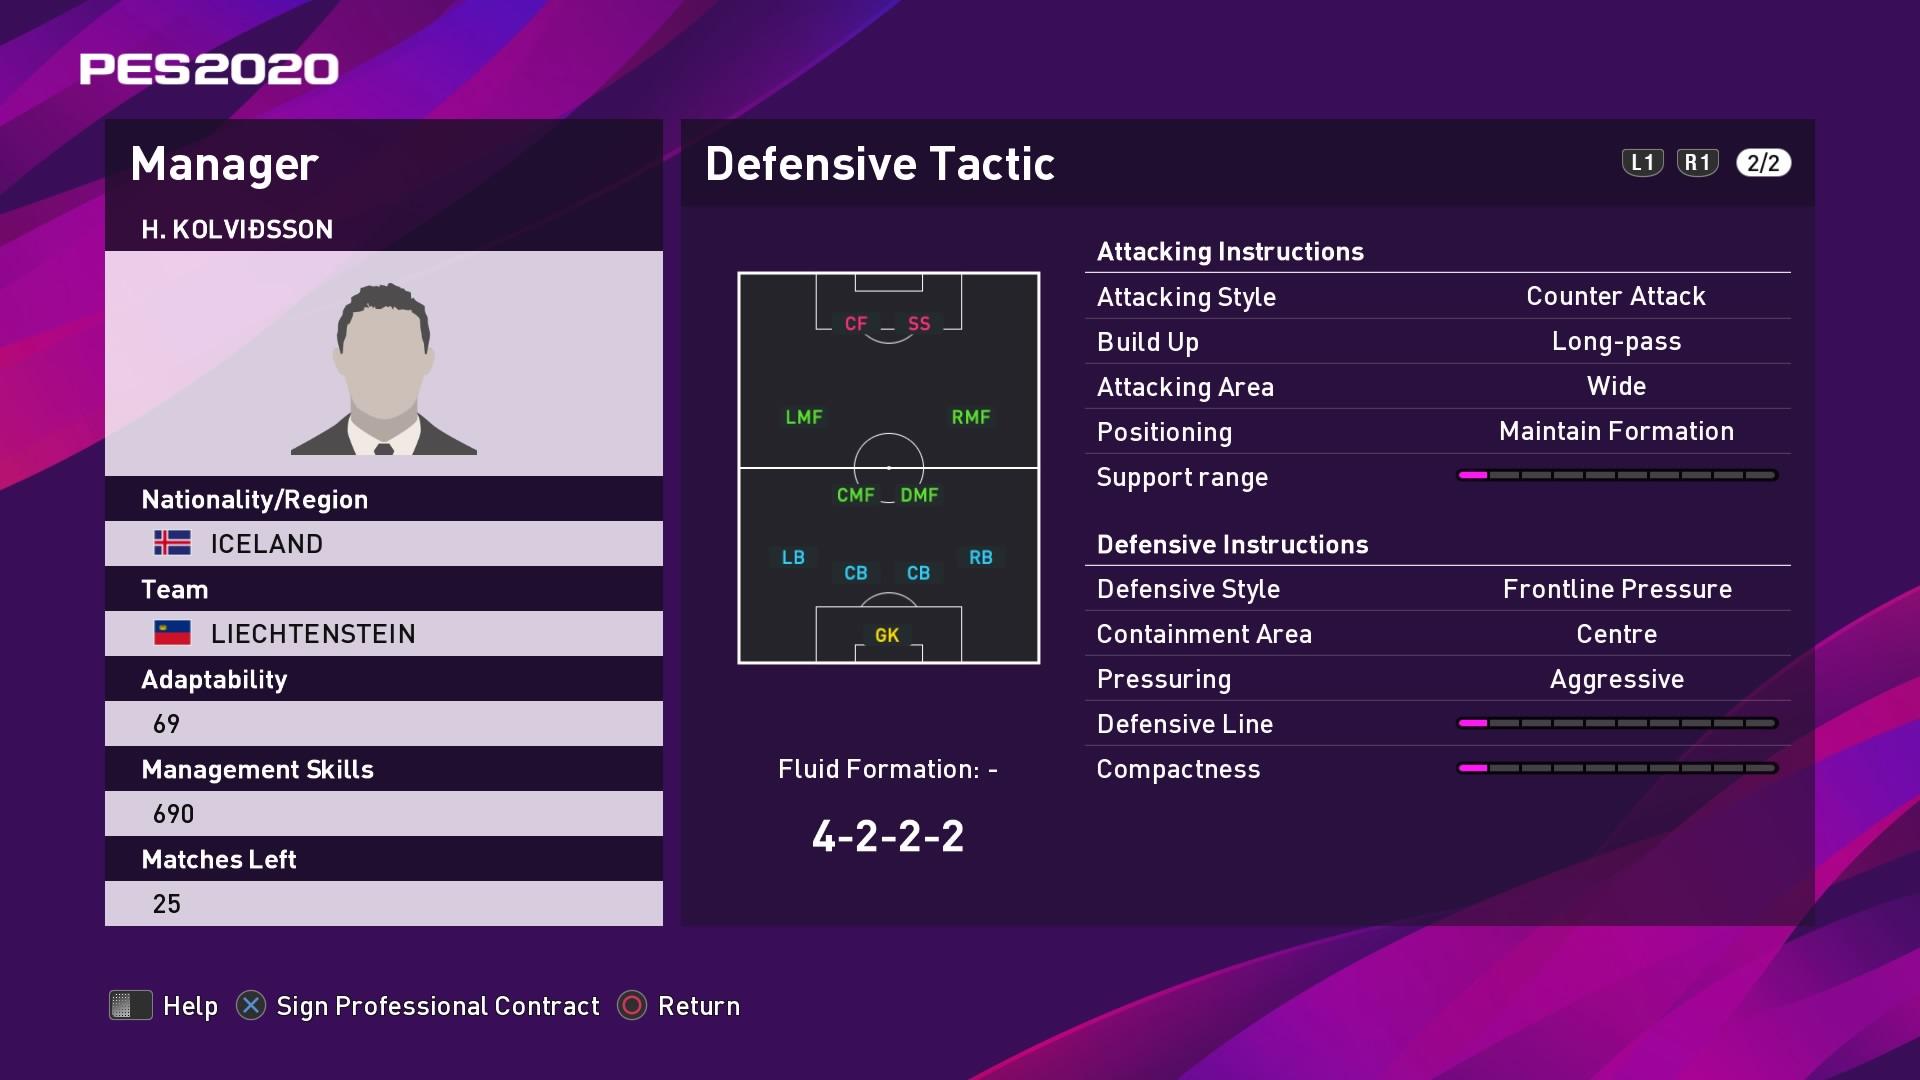 H. Kolviðsson (Helgi Kolviðsson) Defensive Tactic in PES 2020 myClub